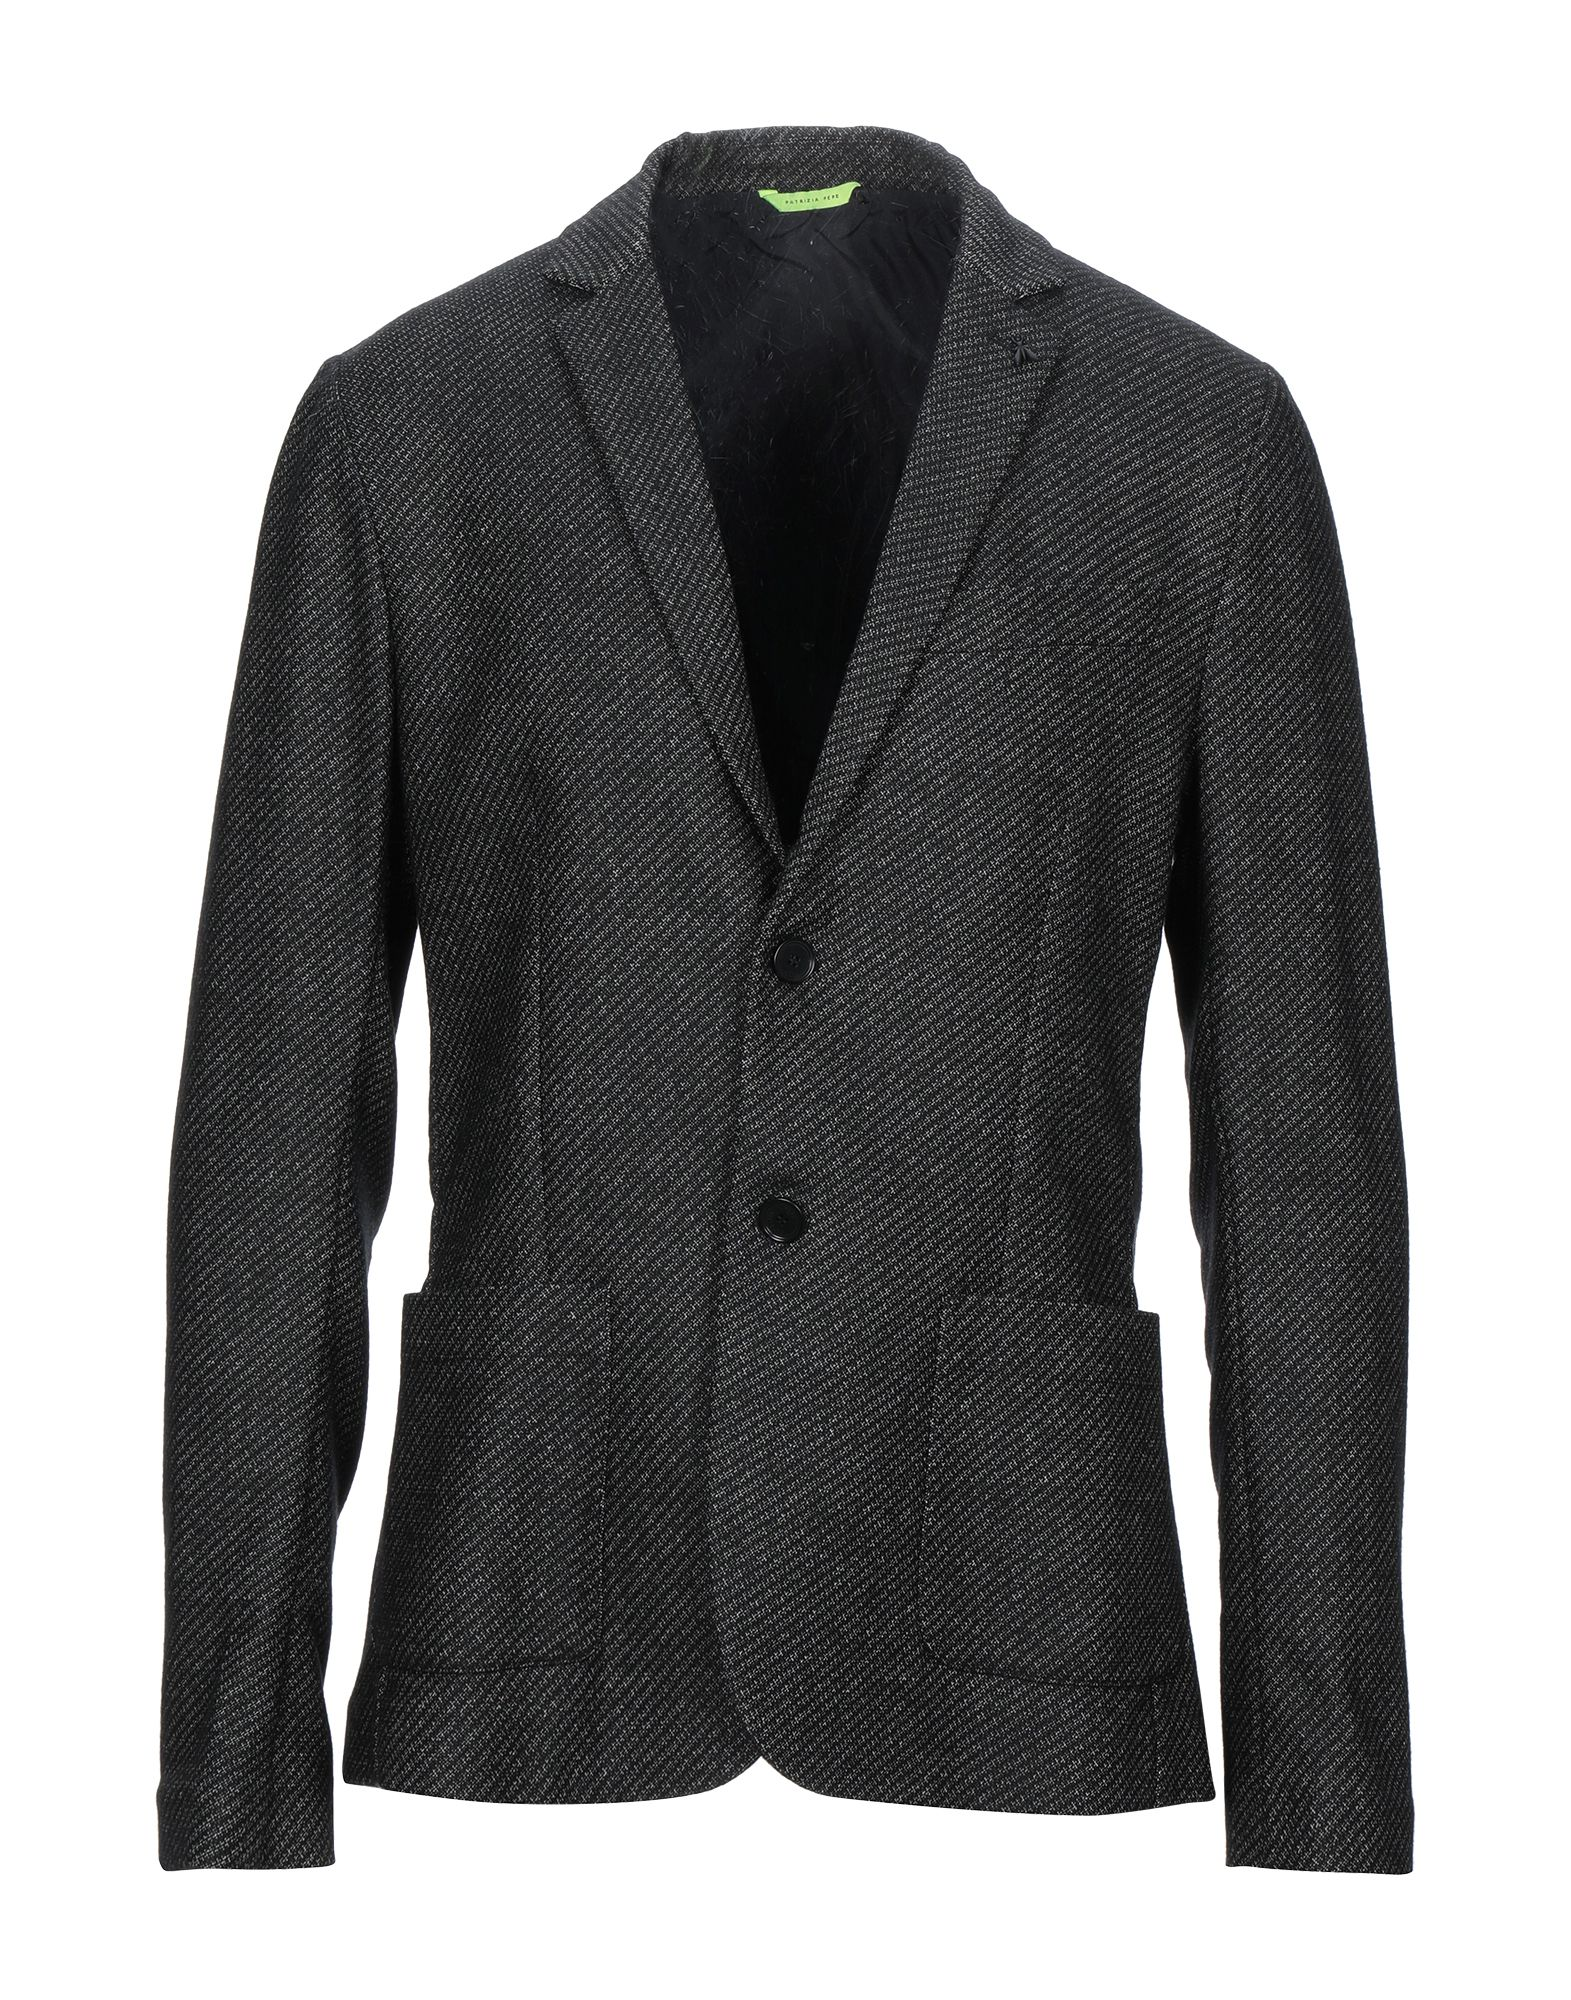 PATRIZIA PEPE Пиджак пиджак patrizia pepe пиджак